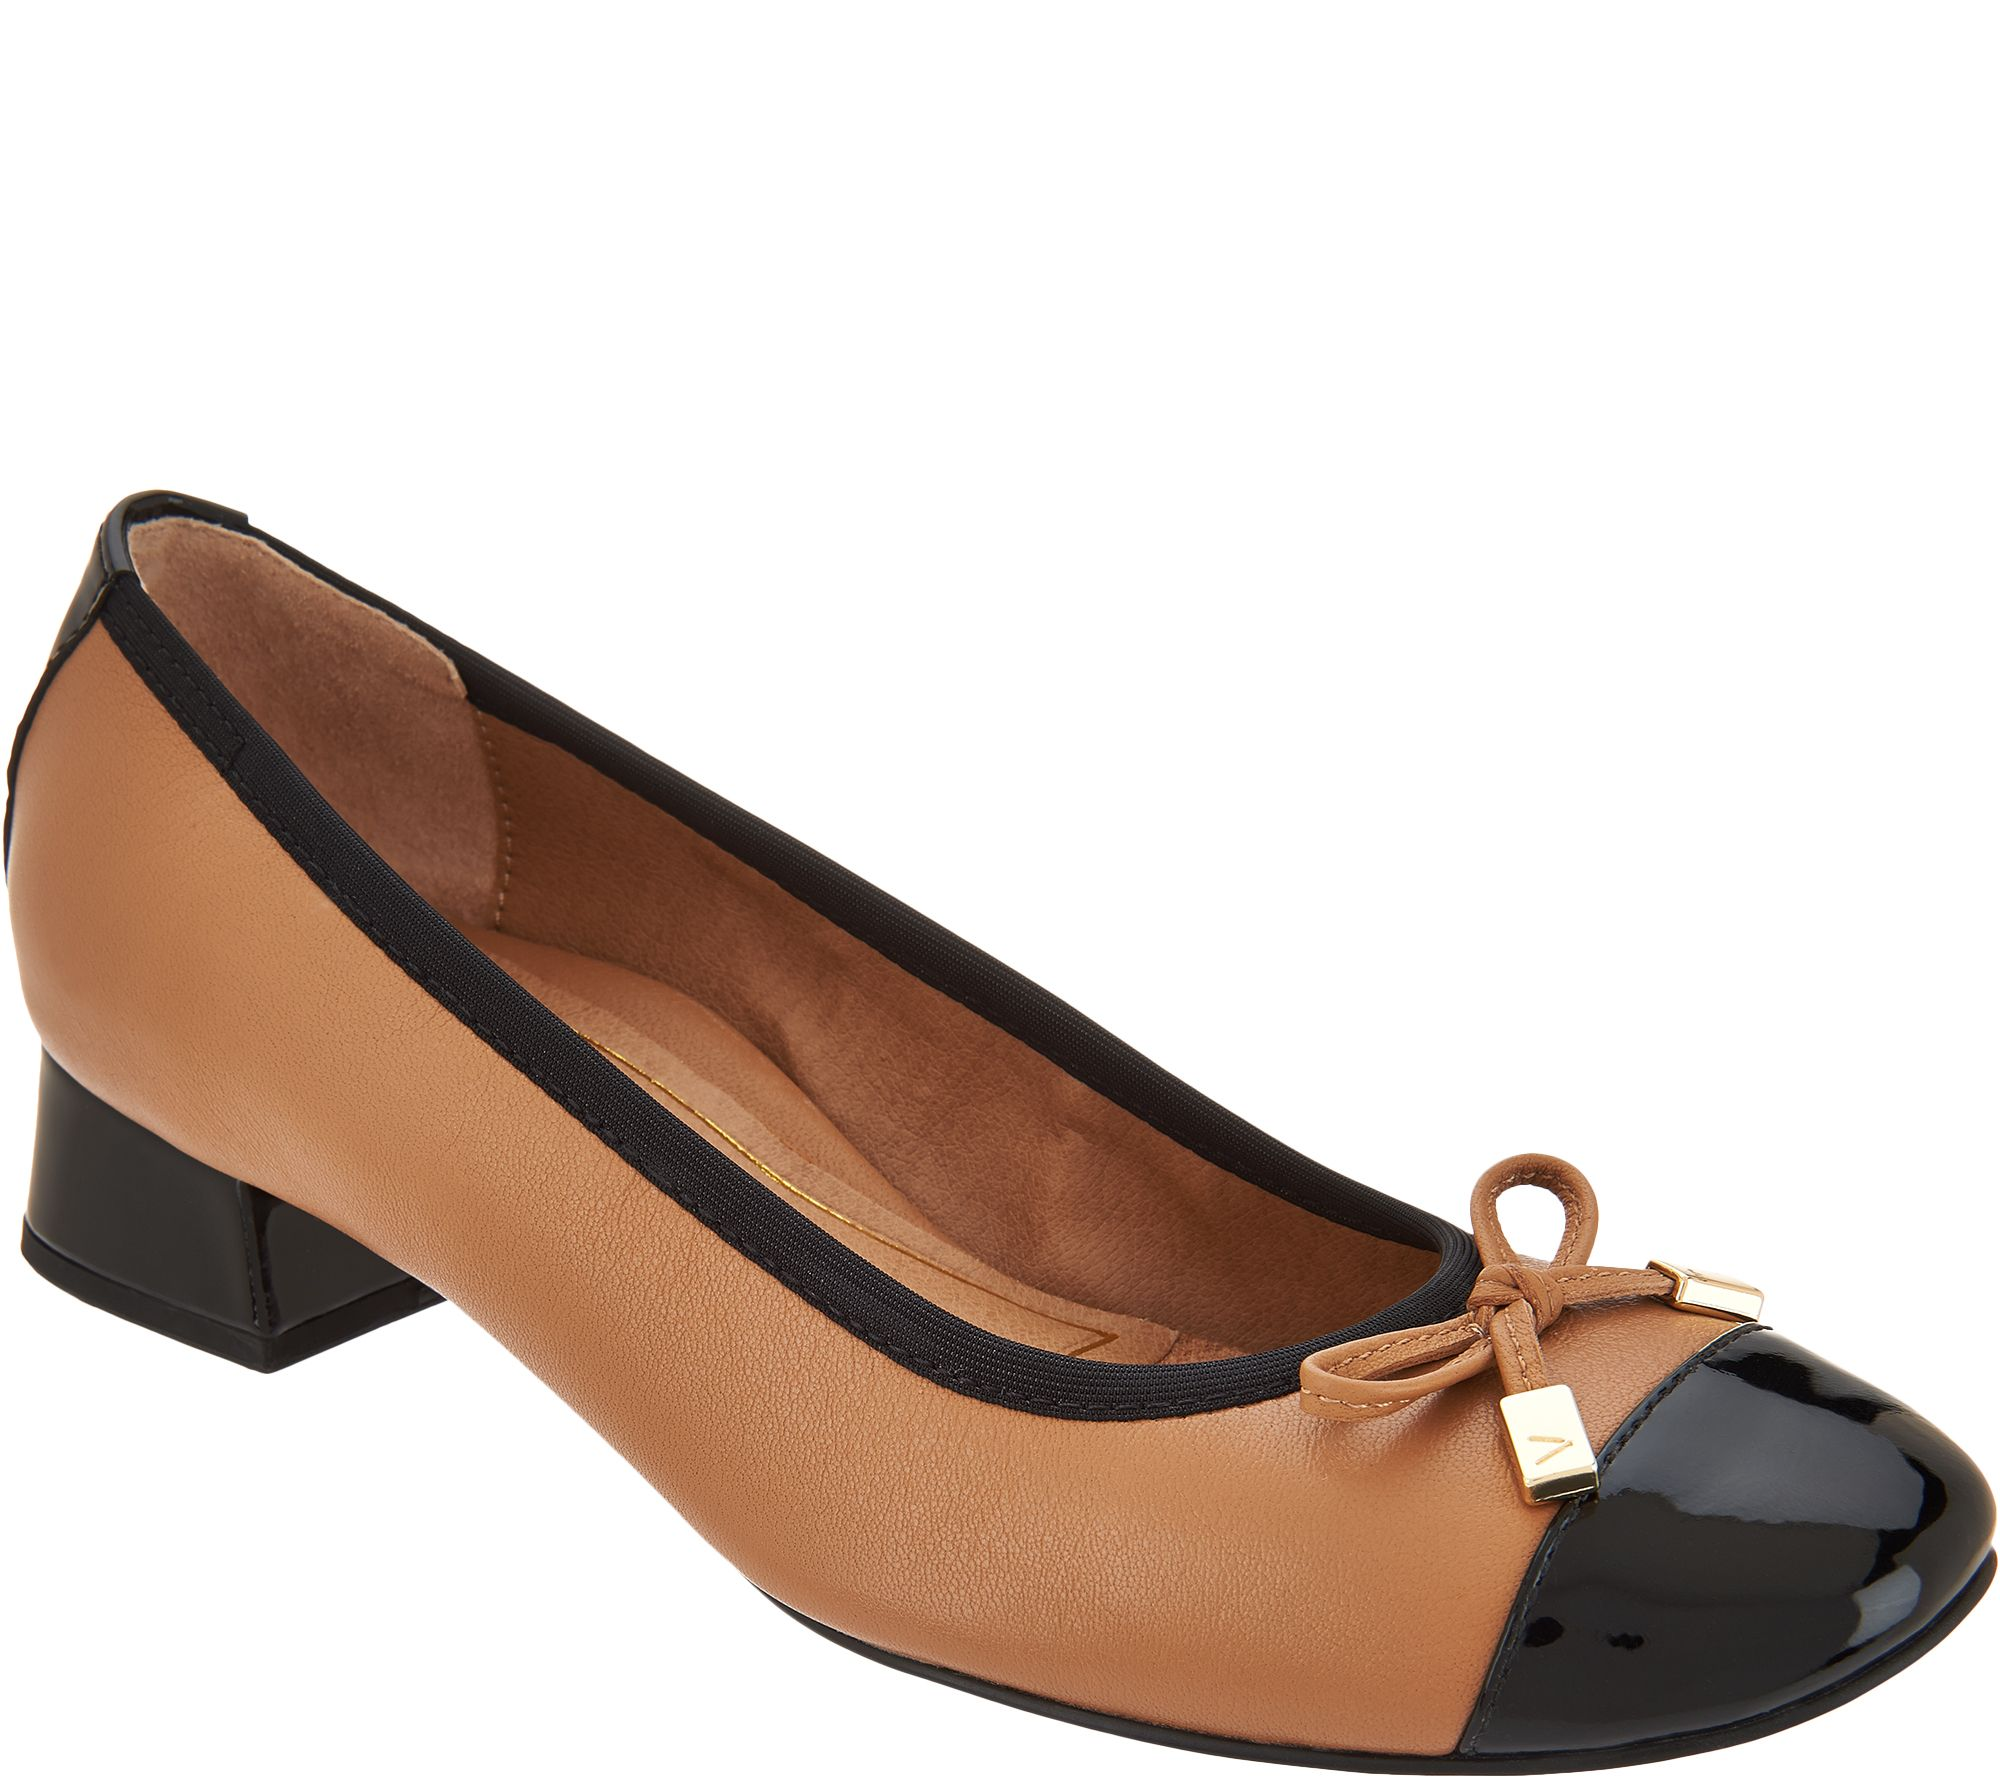 0658982ebeef Vionic Leather Block Heel Pumps - Daphne - Page 1 — QVC.com